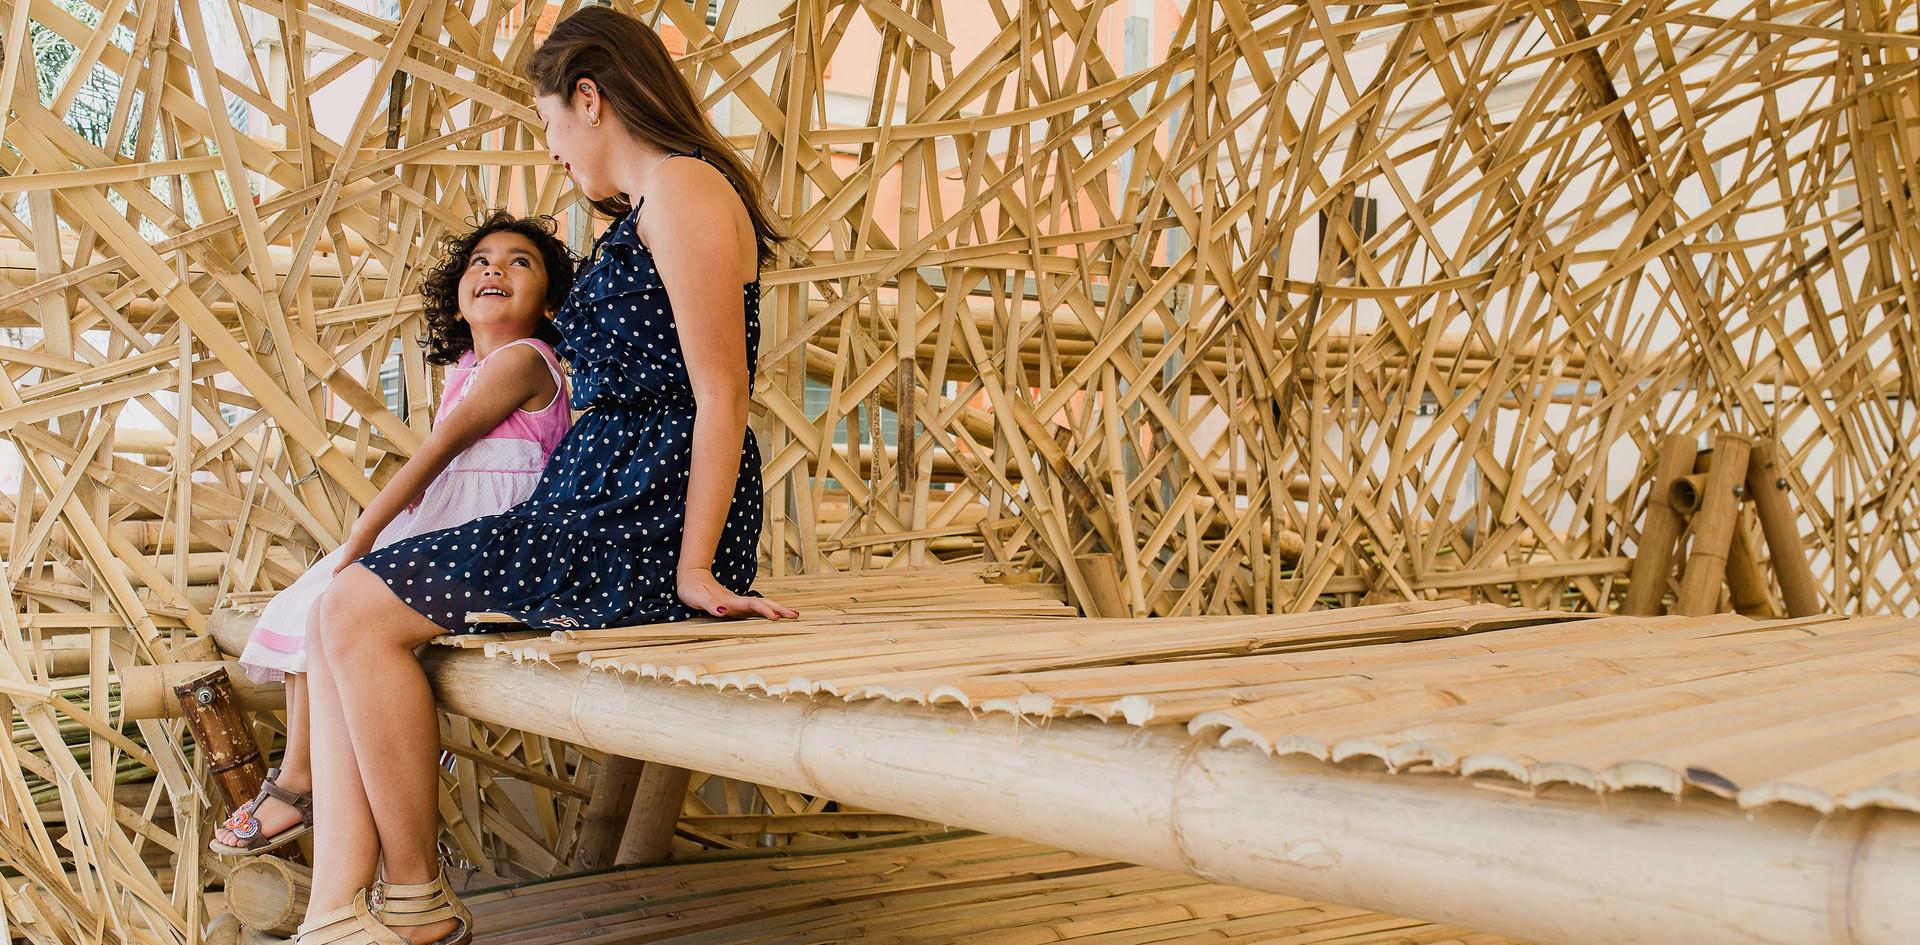 bambú-91.jpg